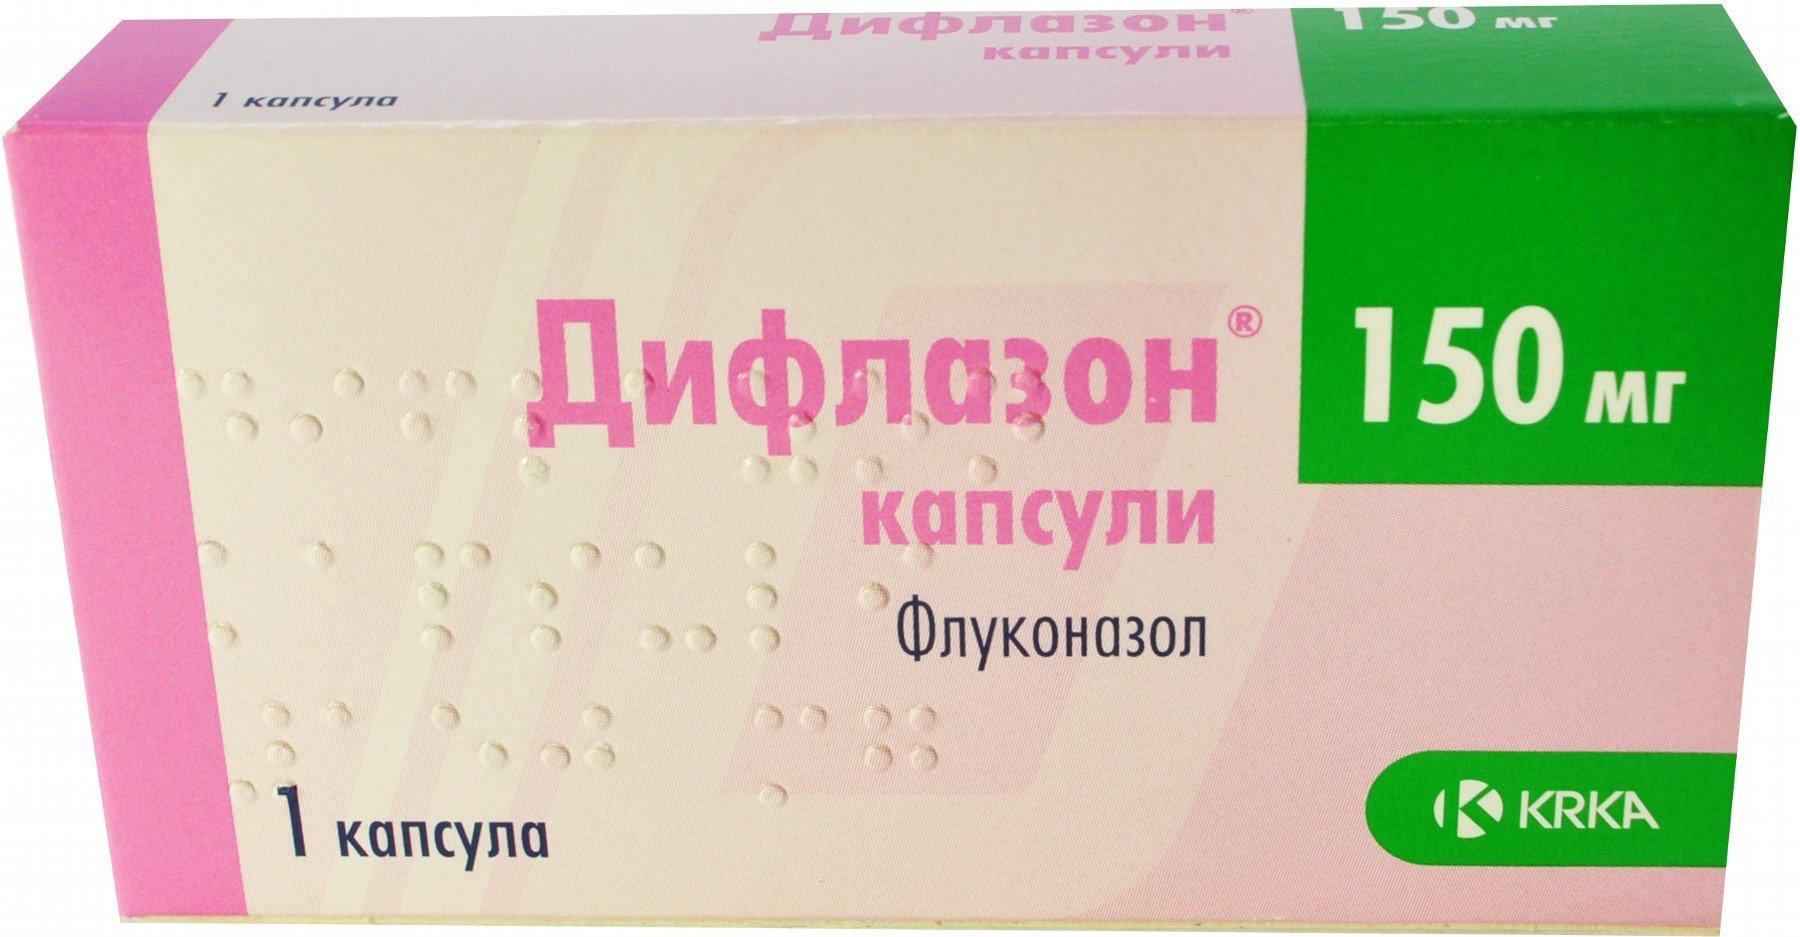 Diflazon (fluconazole) capsules 150 mg. №1